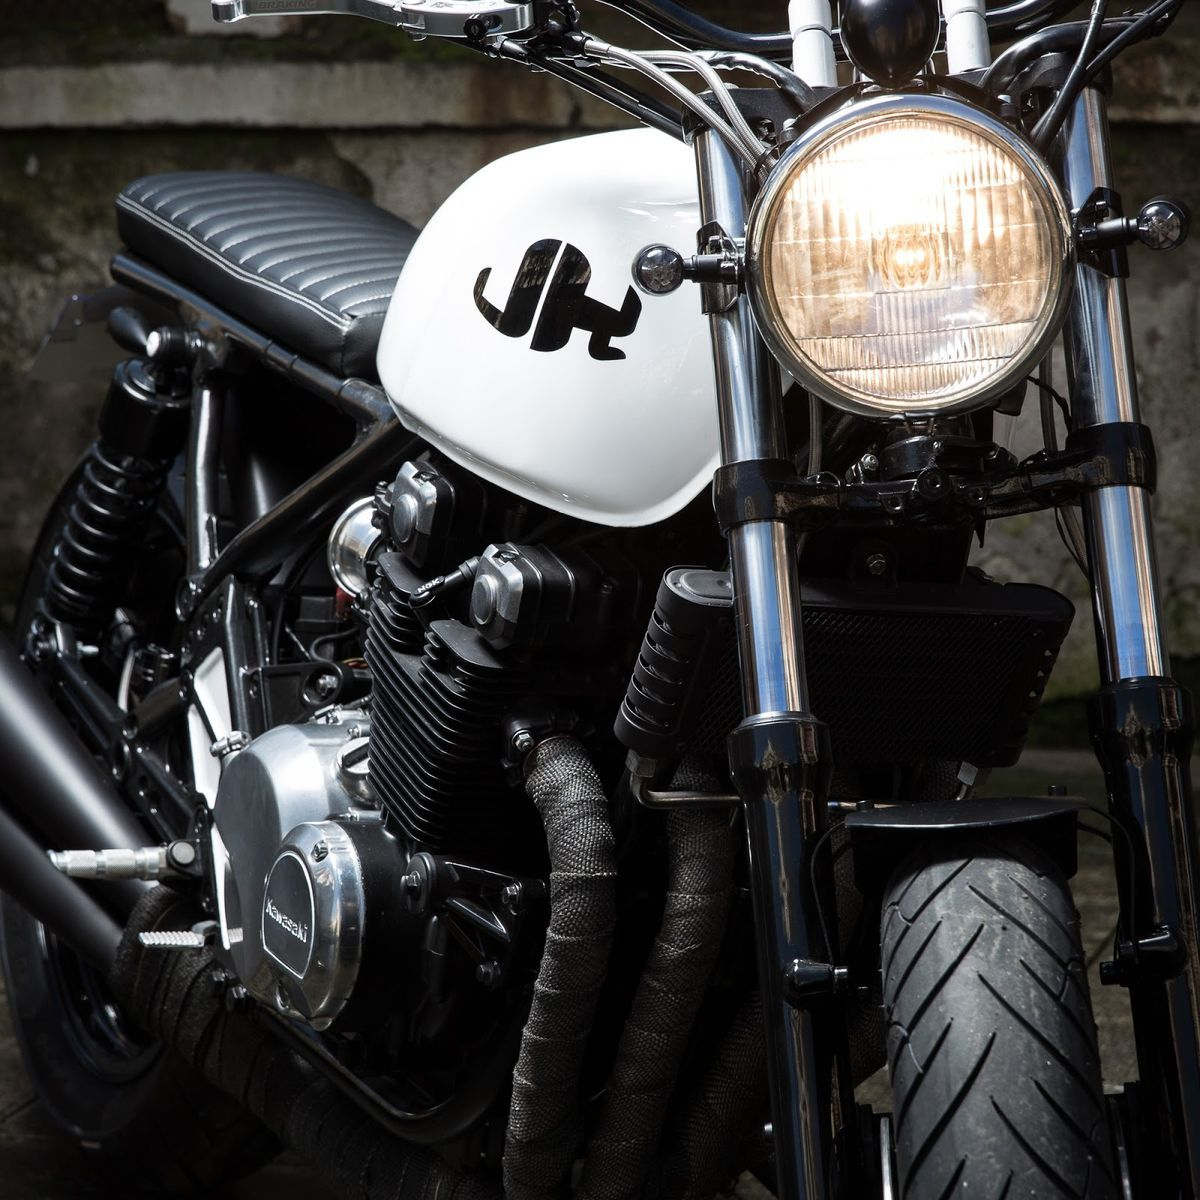 1995 Kawasaki ZR550-B1 ZEPHYR   JeriKan Motorcycle #6